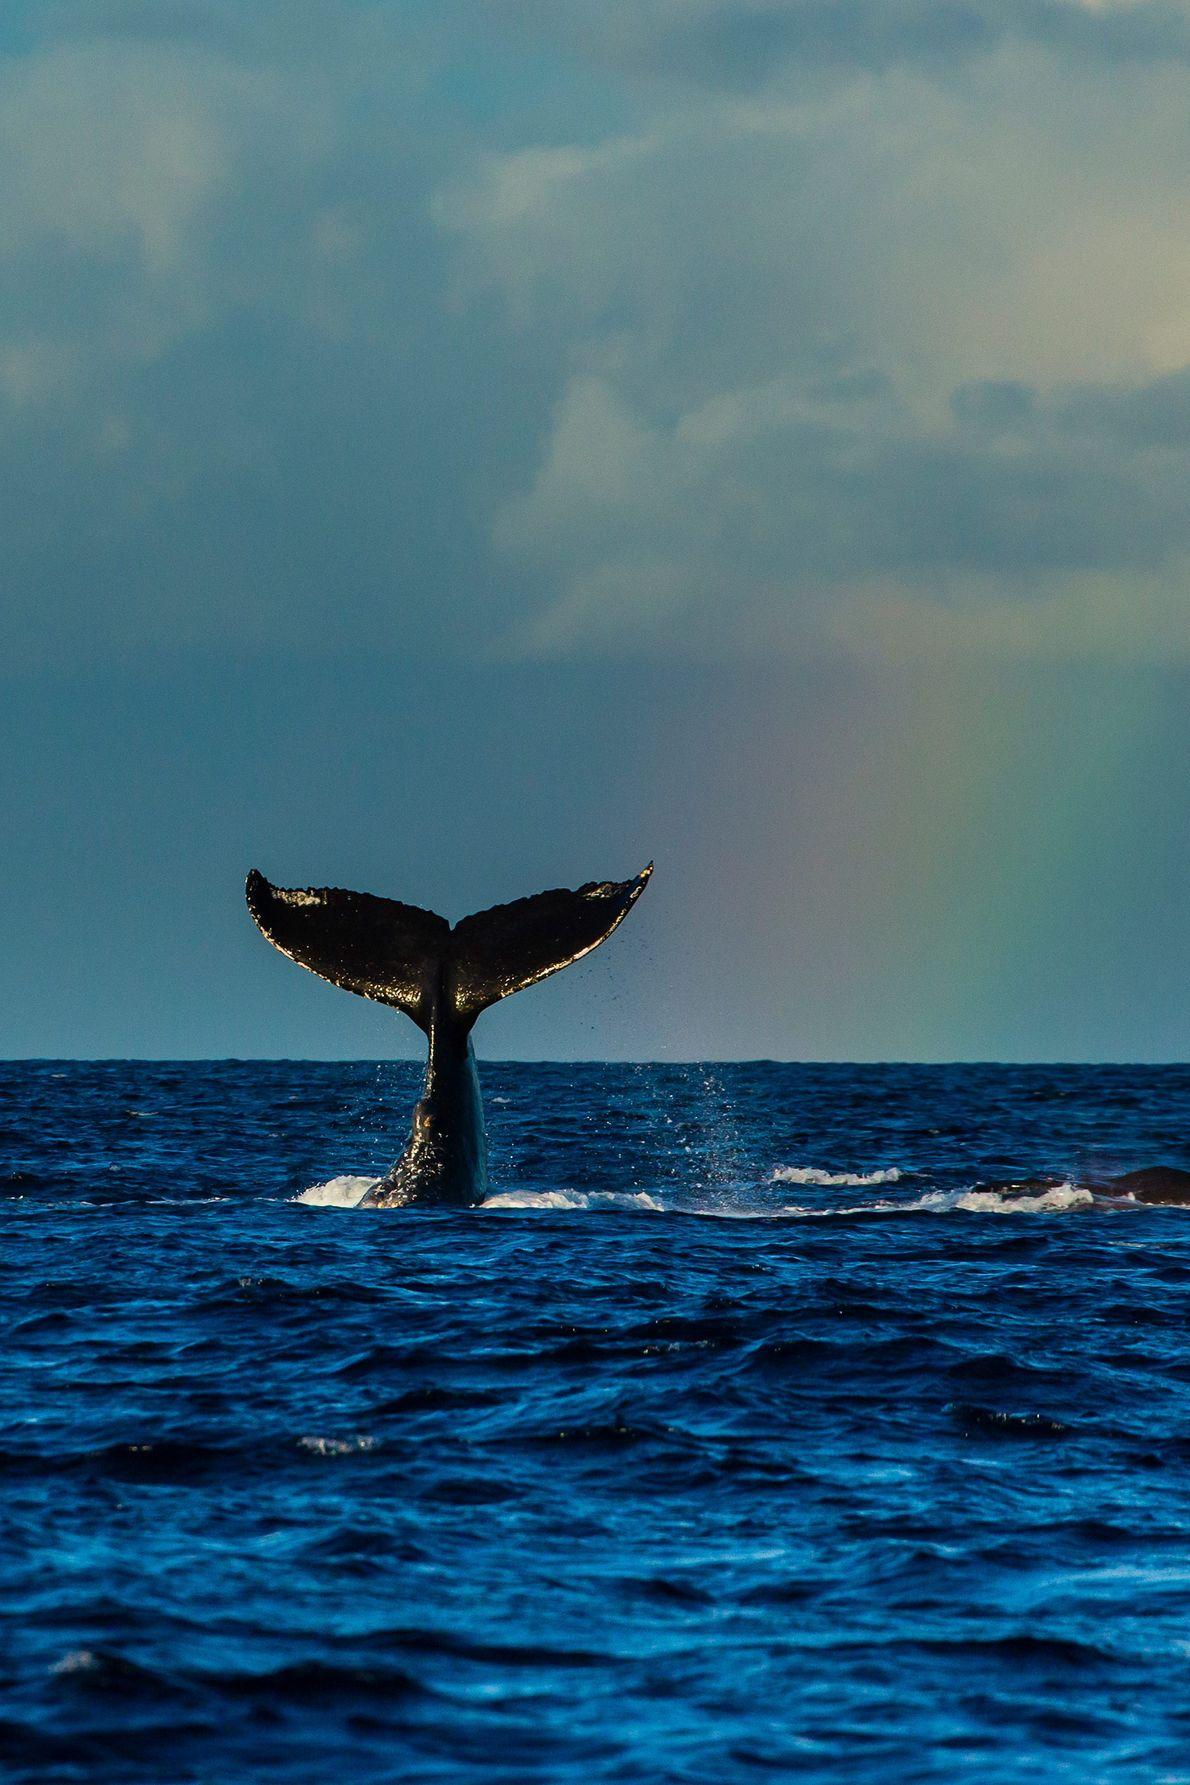 Hawaiian Islands Humpback Whale National Marine Sanctuary, Hawaii